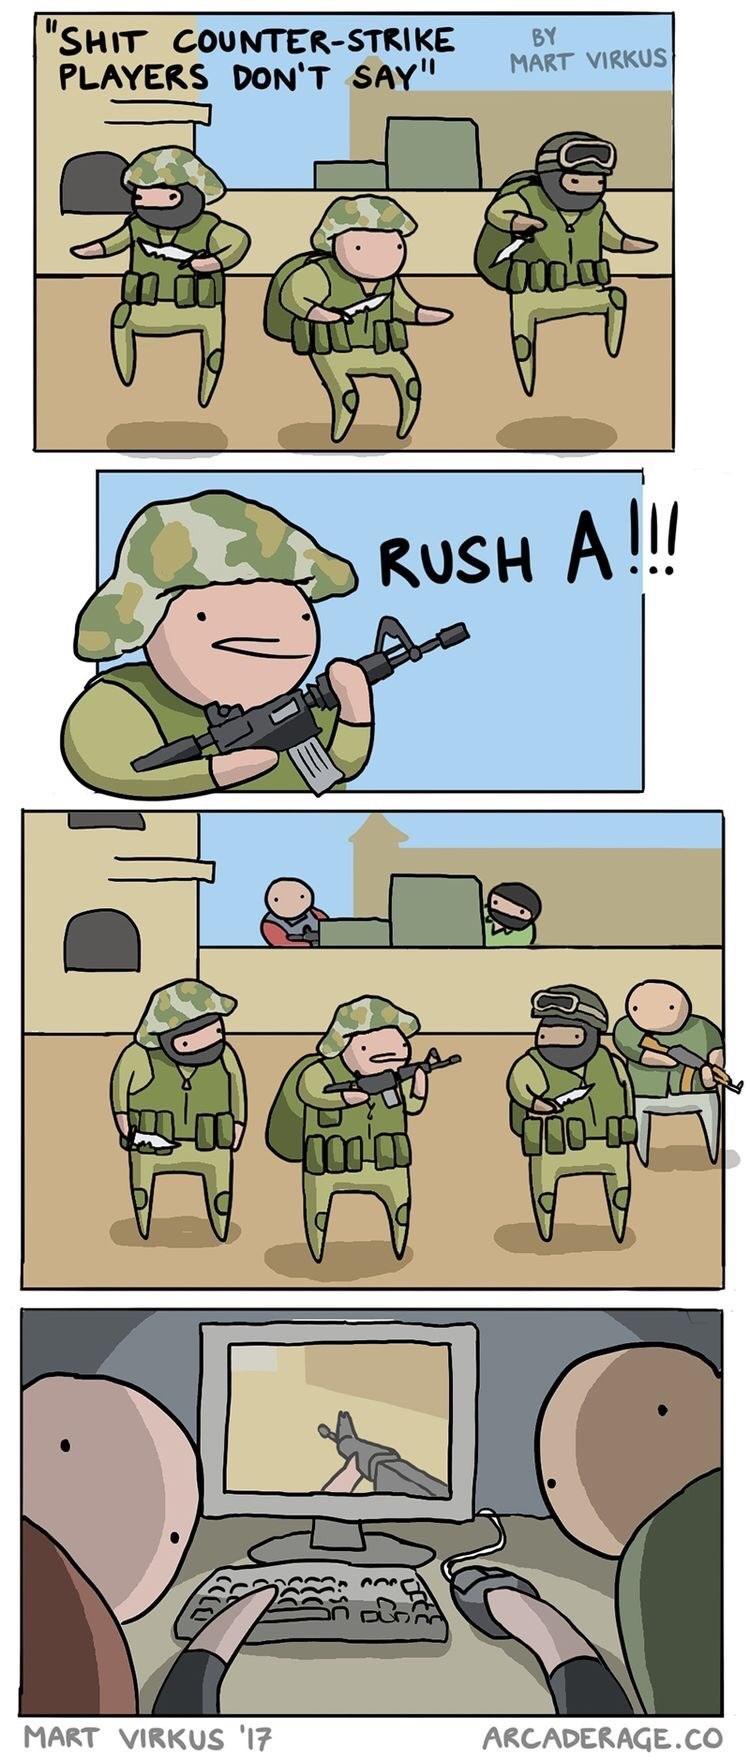 "Cartoon - ""SHIT COUNTER-STRIKE PLAYERS DON'T SAY"" BY MART VIRKUS RUSH A!!! MART VIRKUS '17 ARCADERAGE.CO"